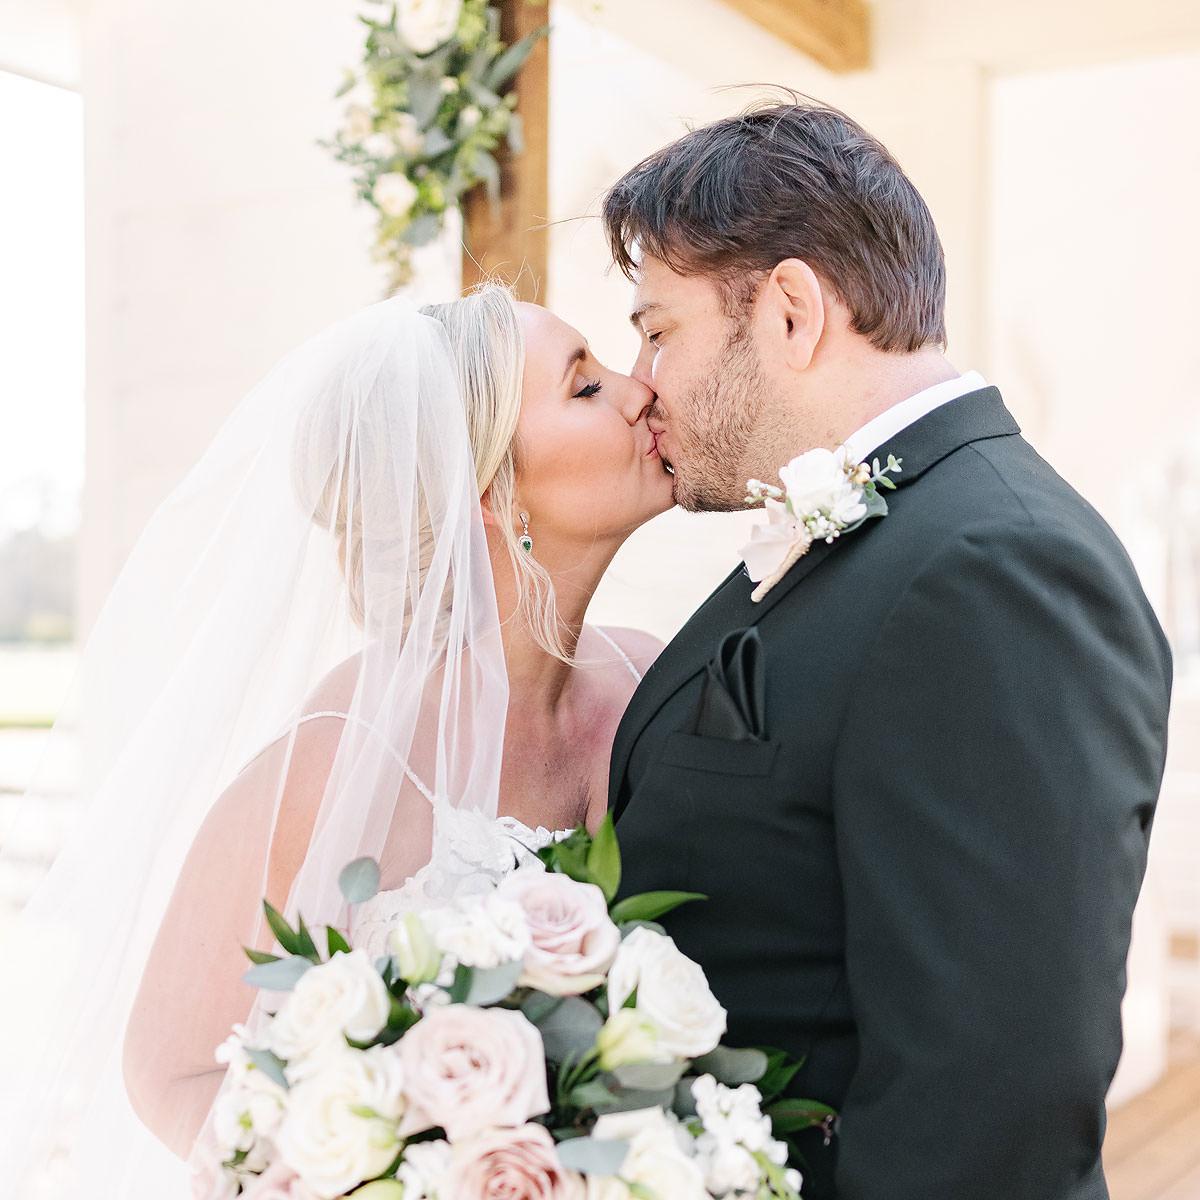 The Berry Barn Liuzza Farms Wedding Photographer | Chelsey & David